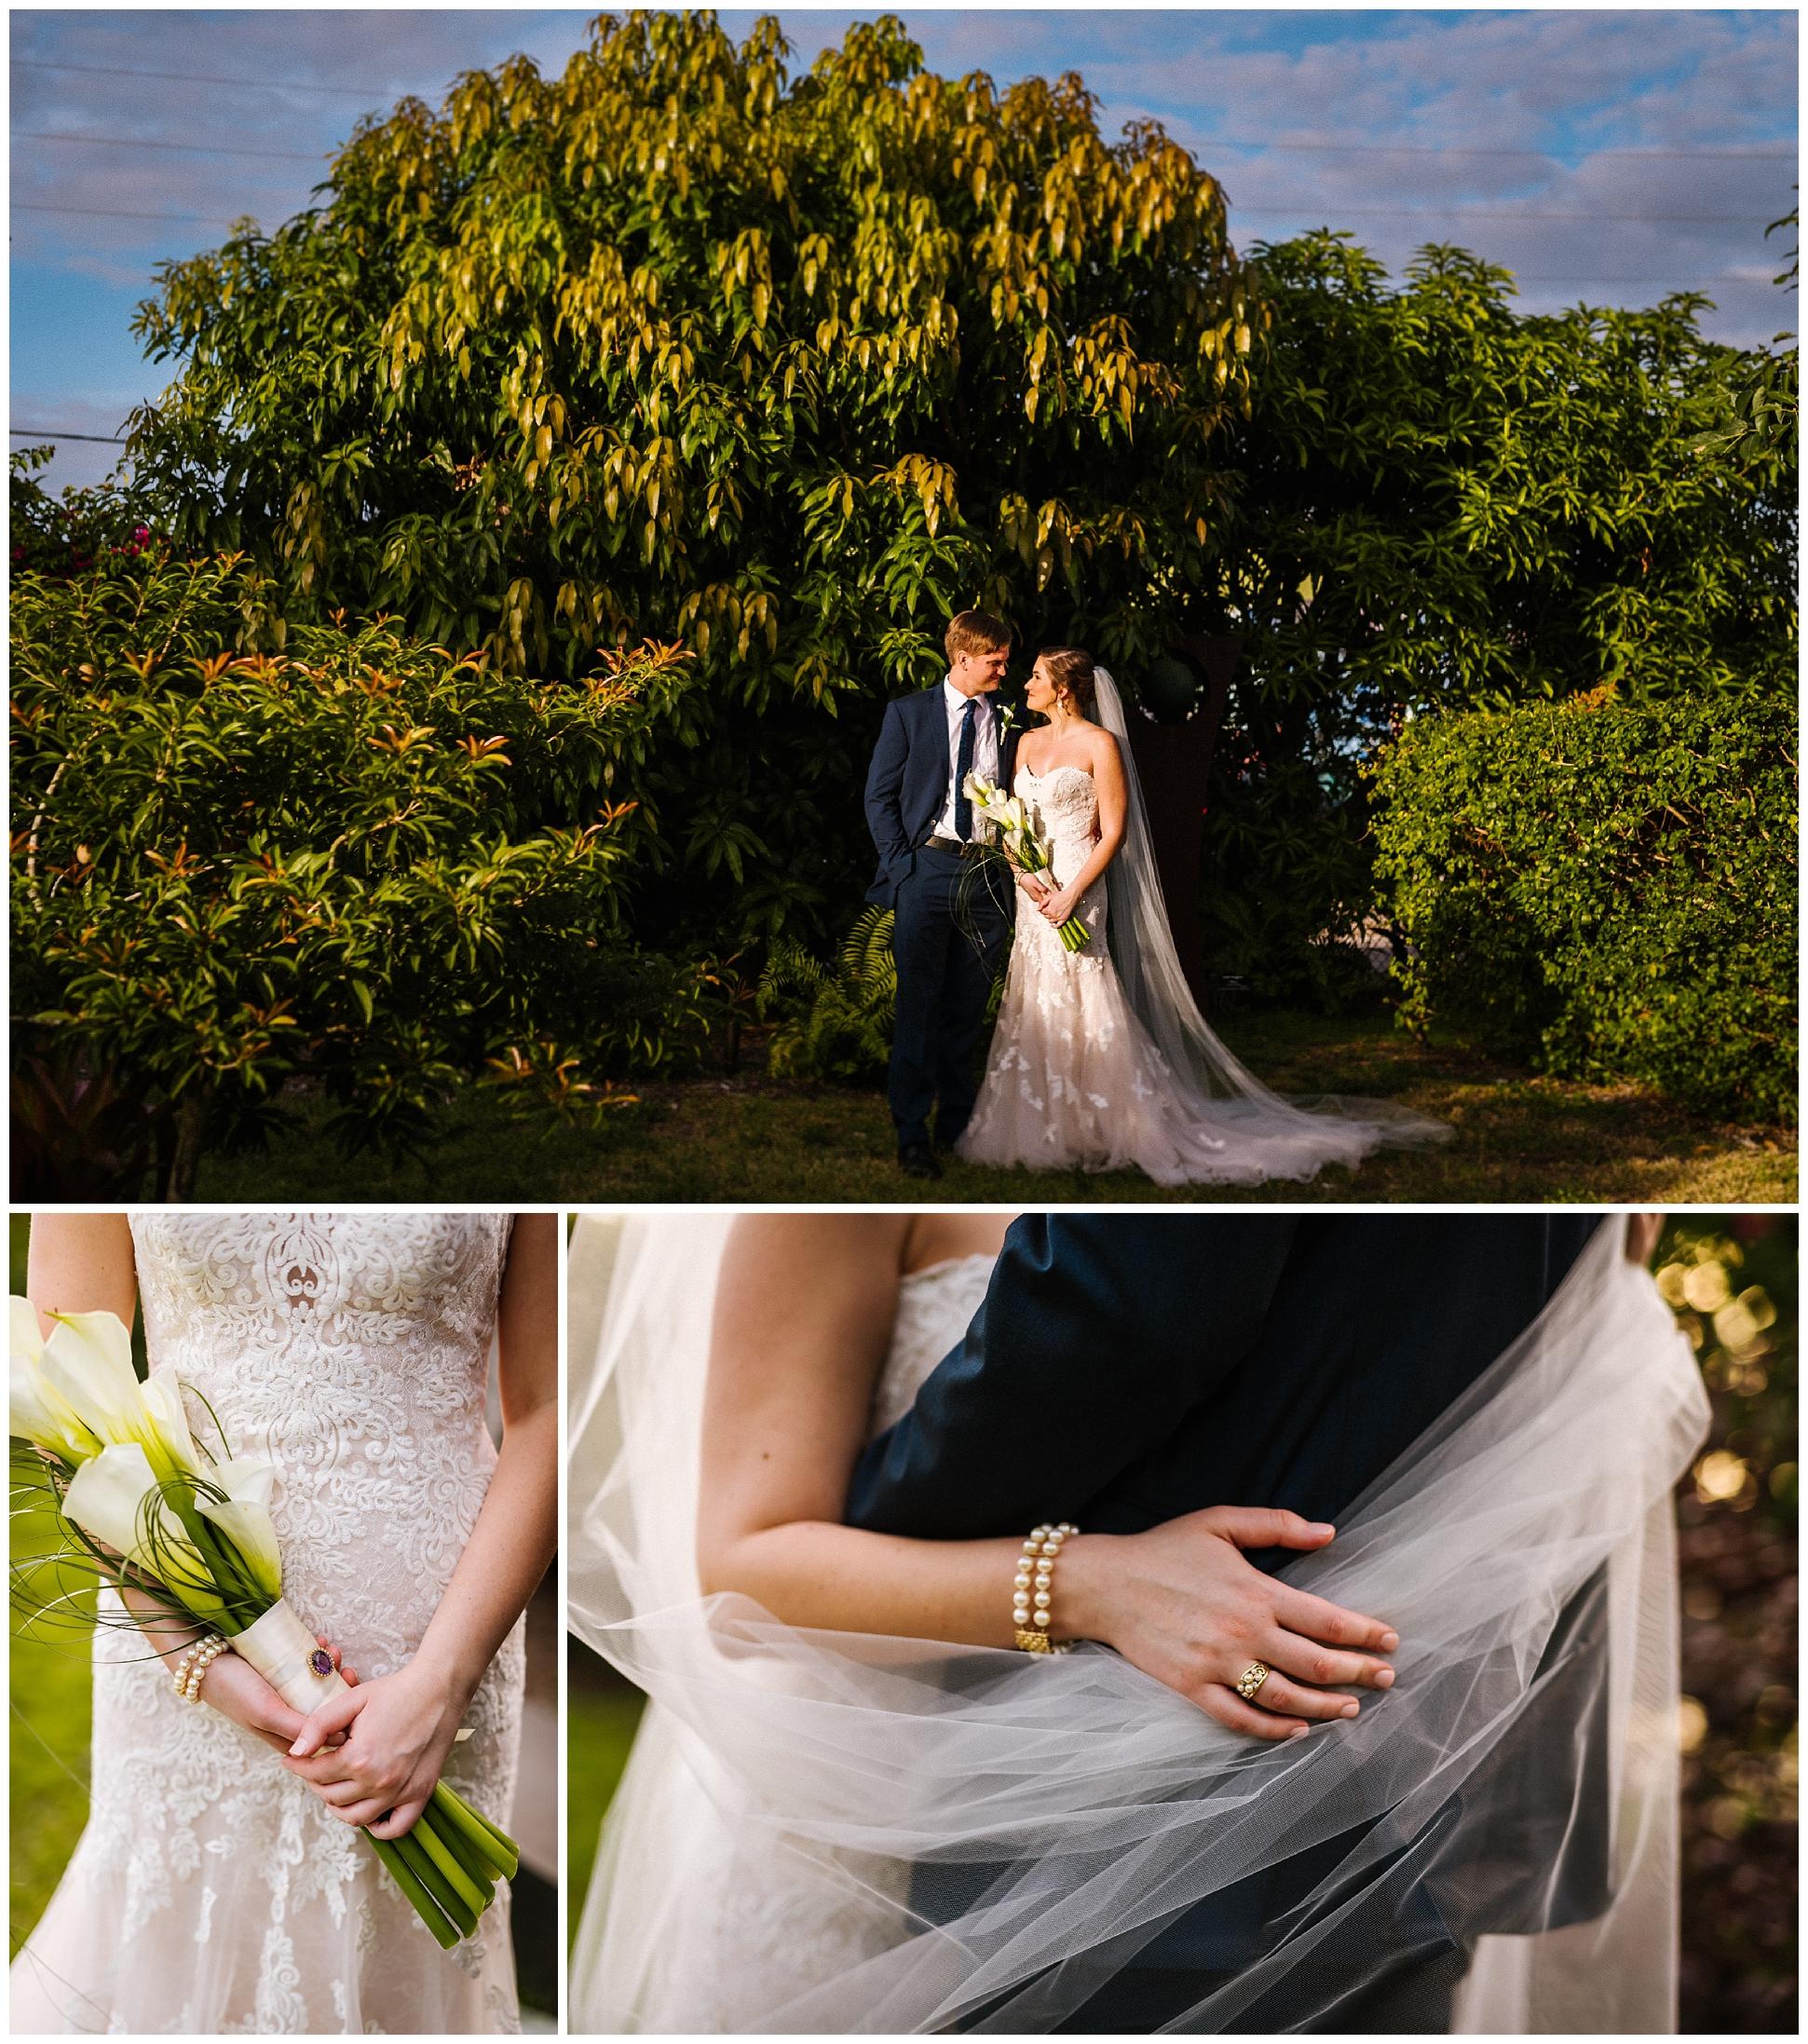 St-pete-wedding-photography-unique-glass-blowing-gallery-succulent-art_0020.jpg